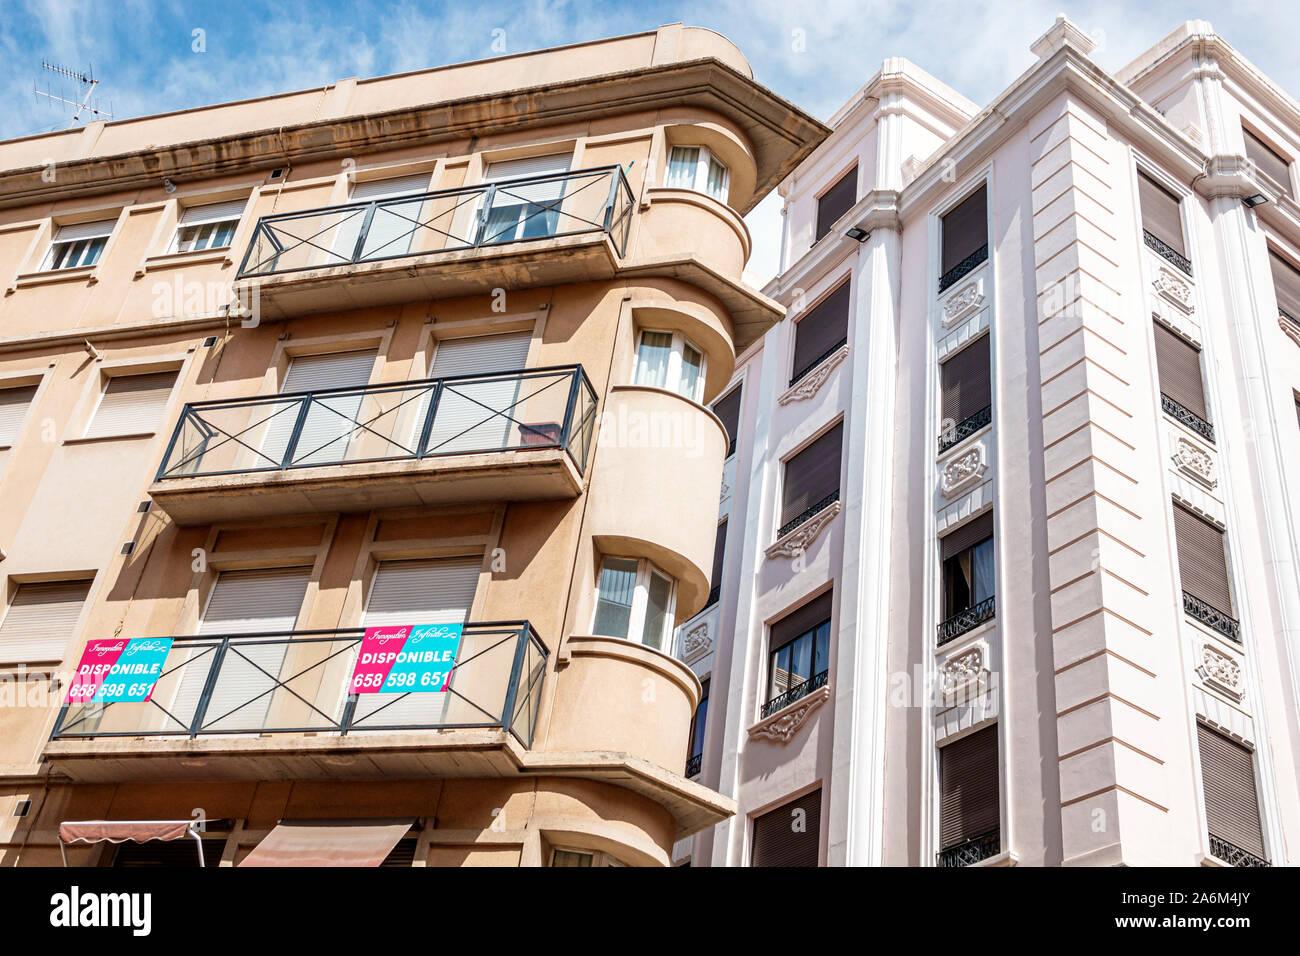 Valencia Spain Hispanic,Ciutat Vella,old city,historic center,apartment buildings,available rental,sign,balcony,ES190829017 Stock Photo